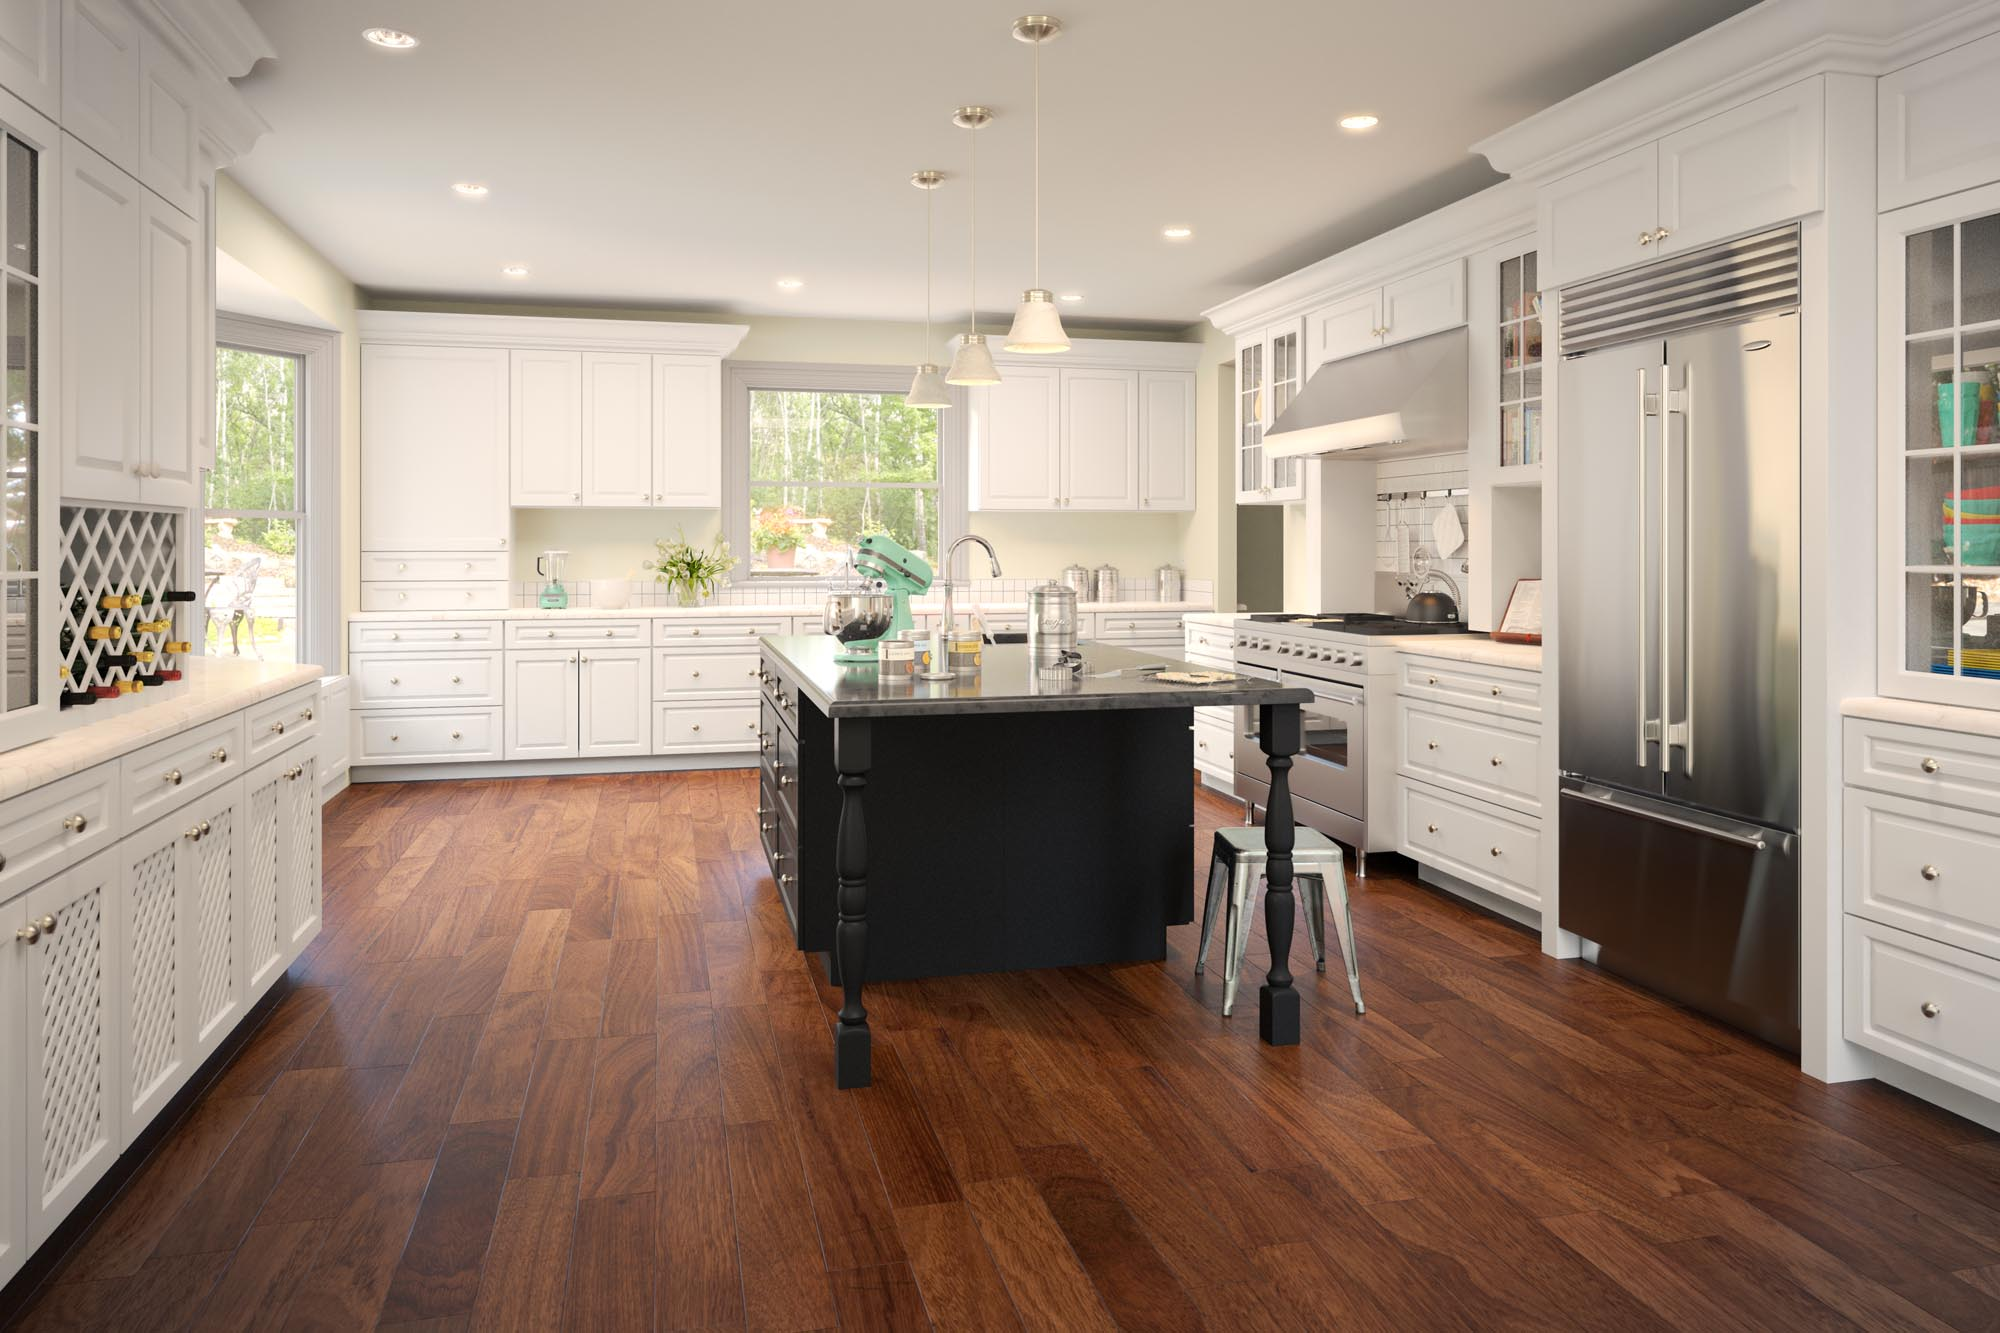 light_ktichen_cabinets_wood_floor